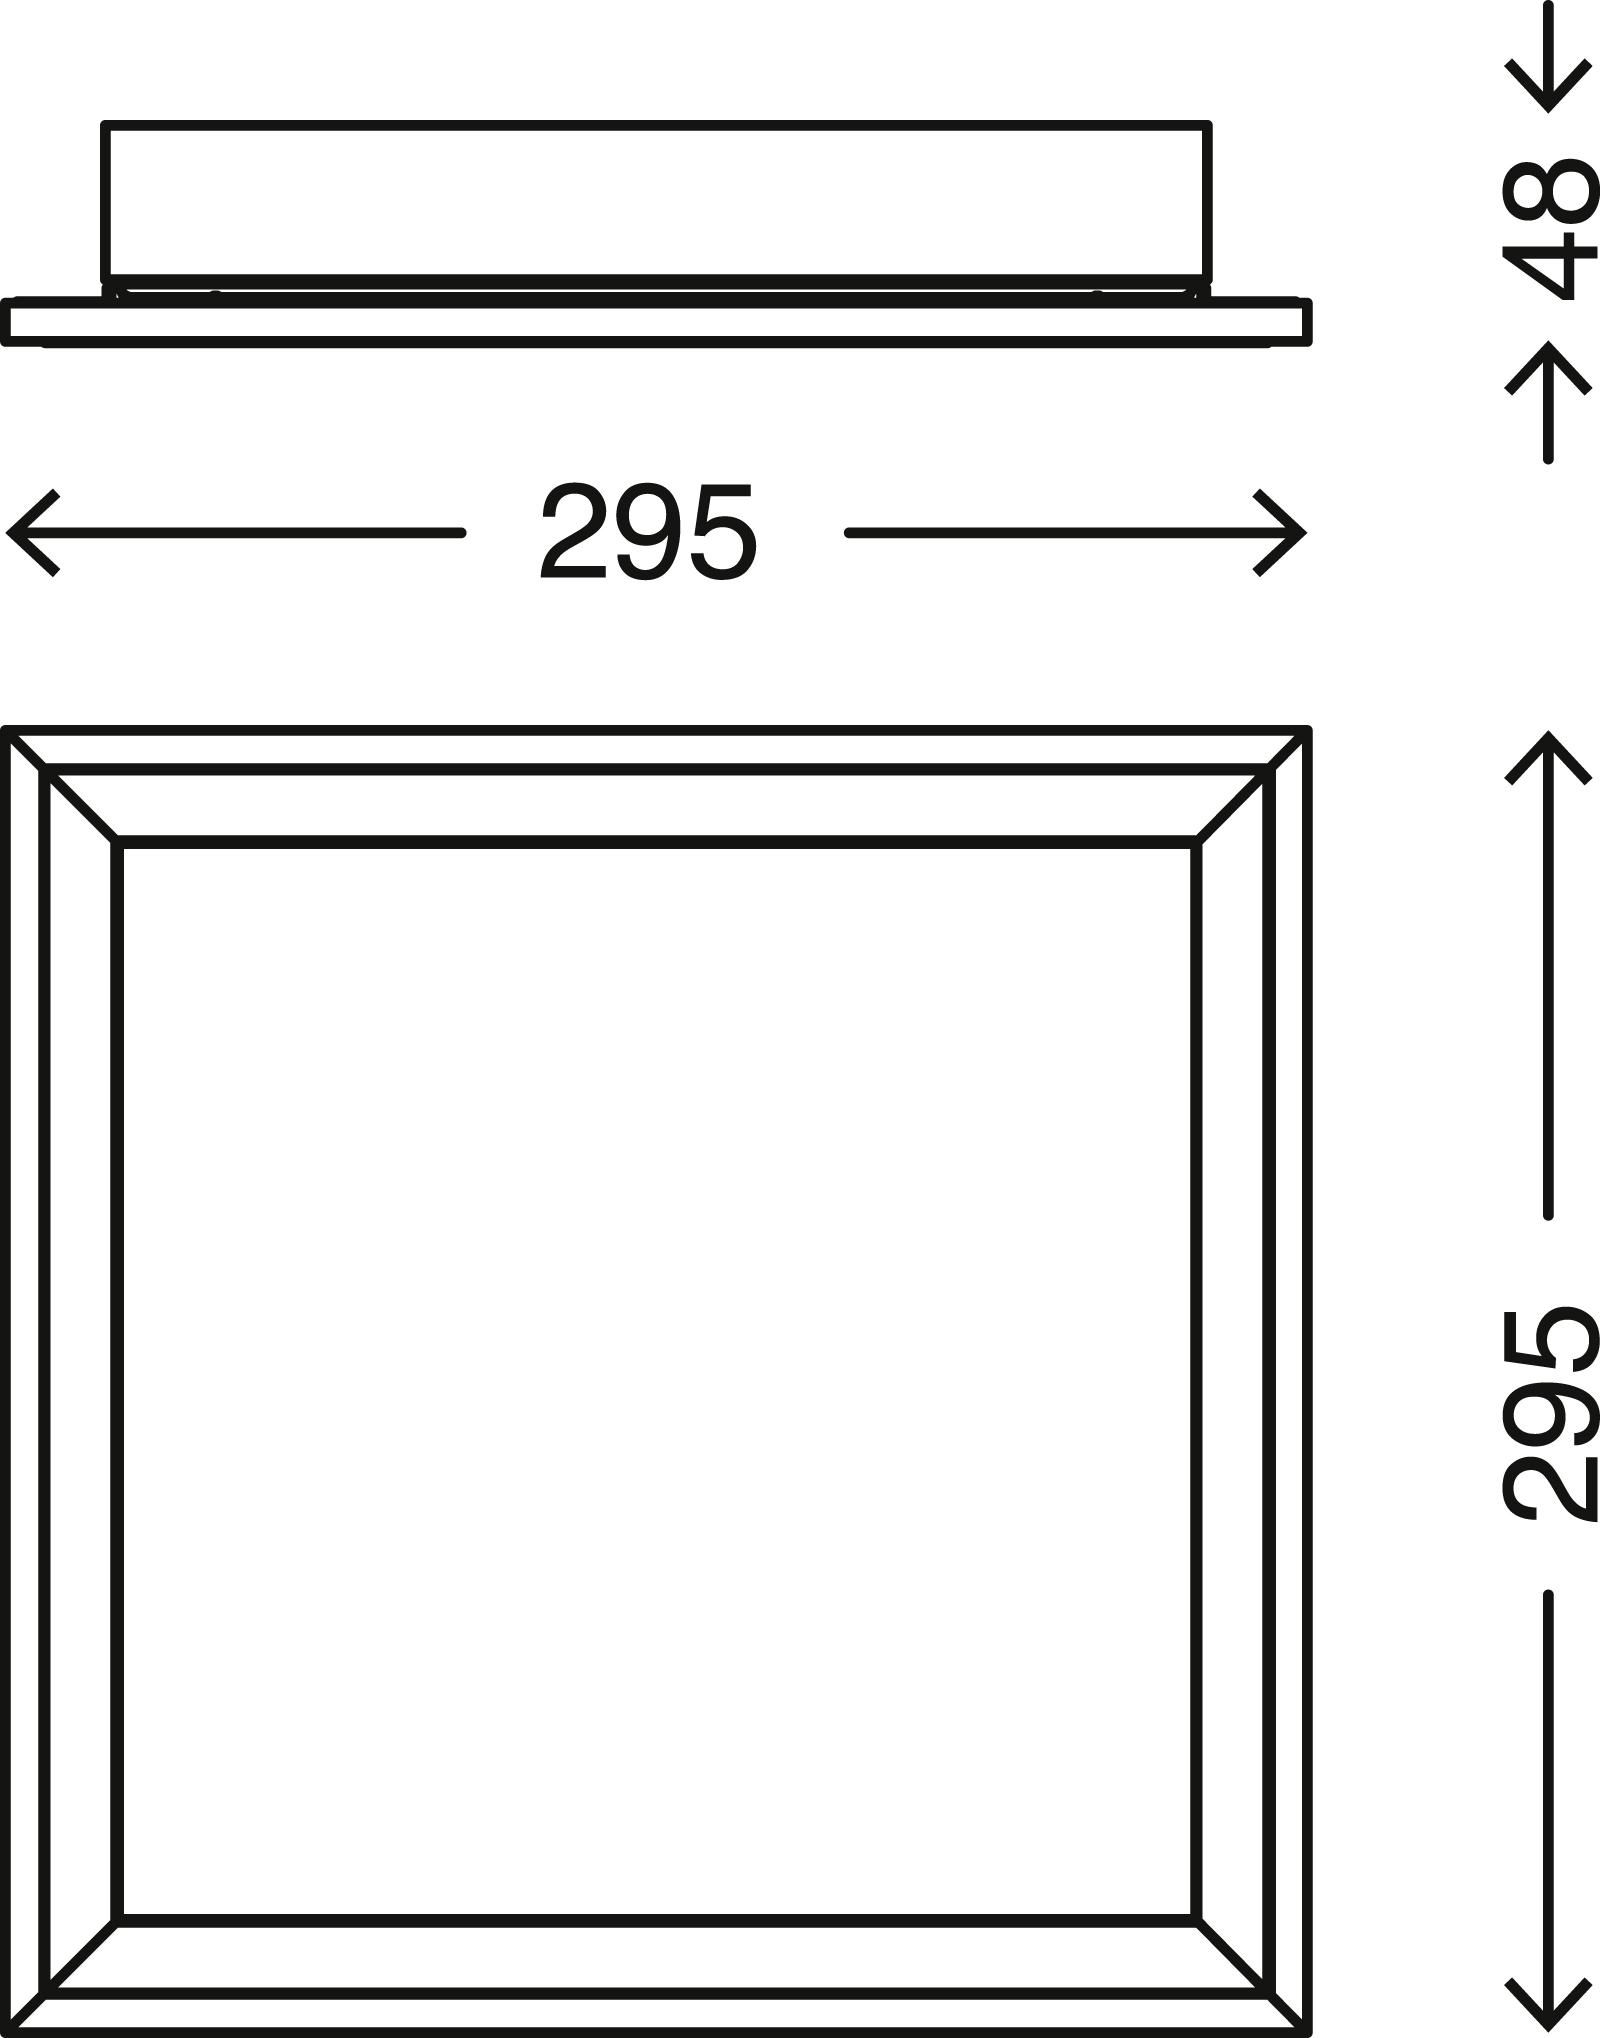 CCT LED Panel, 29,5 cm, 1800 LUMEN, 18 WATT, Weiss